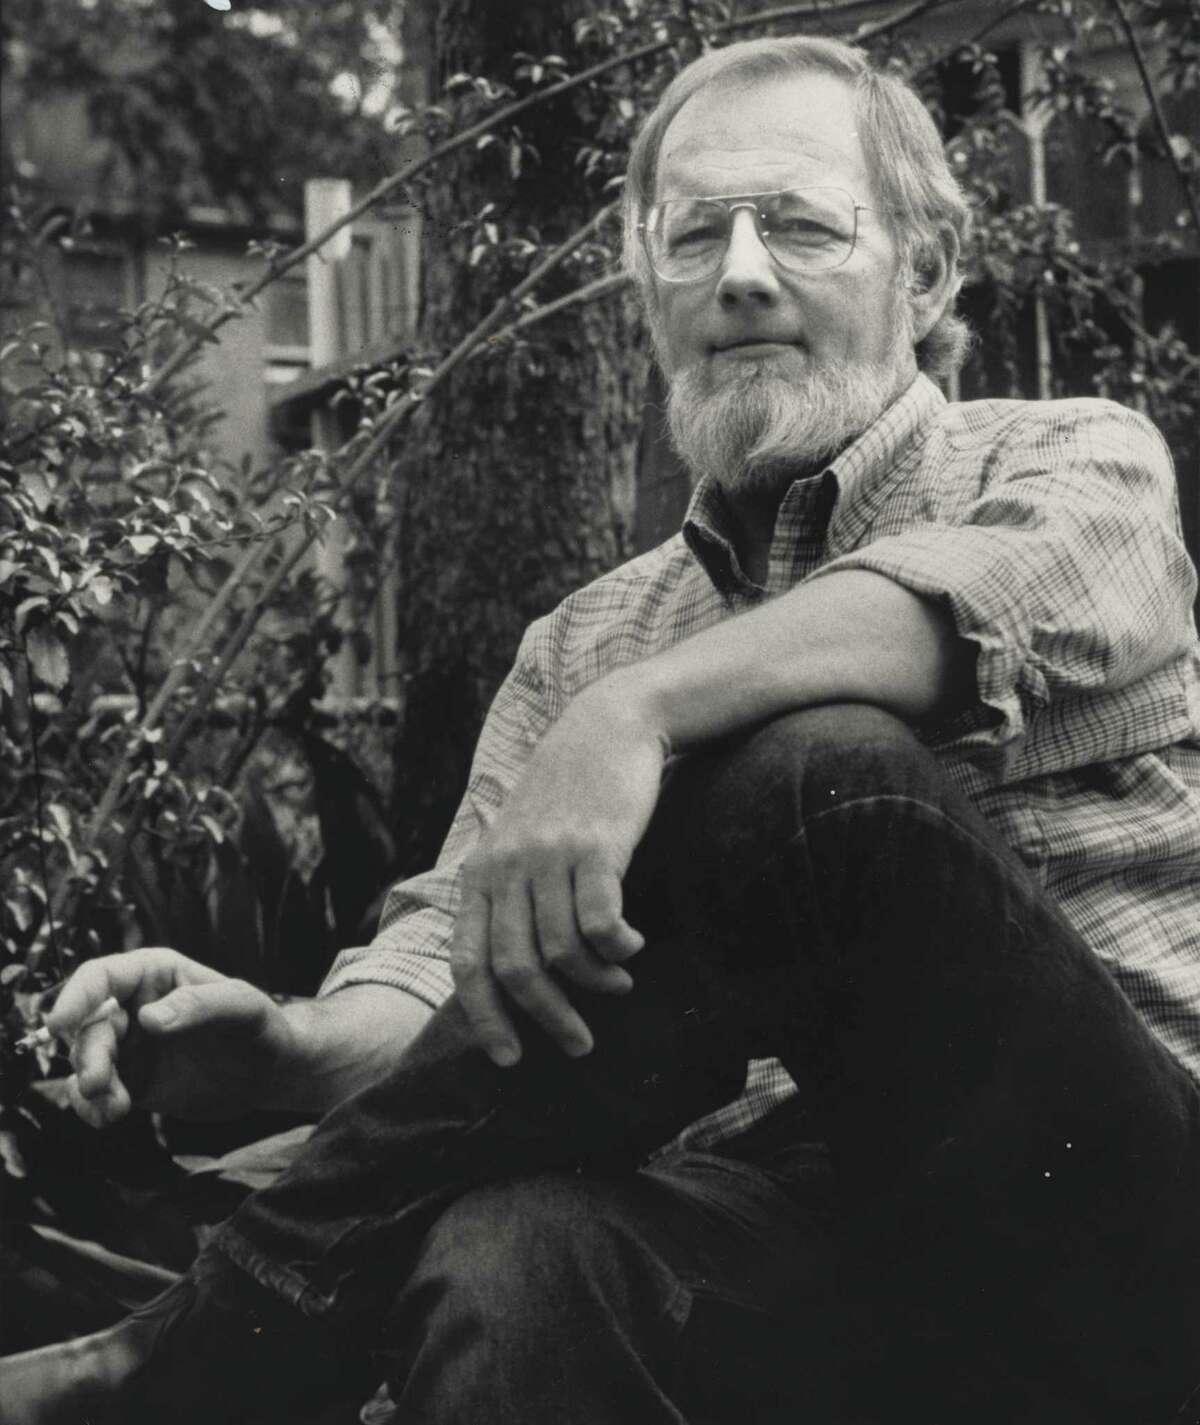 03/22/1984 - author Donald Barthelme at his Houston home.